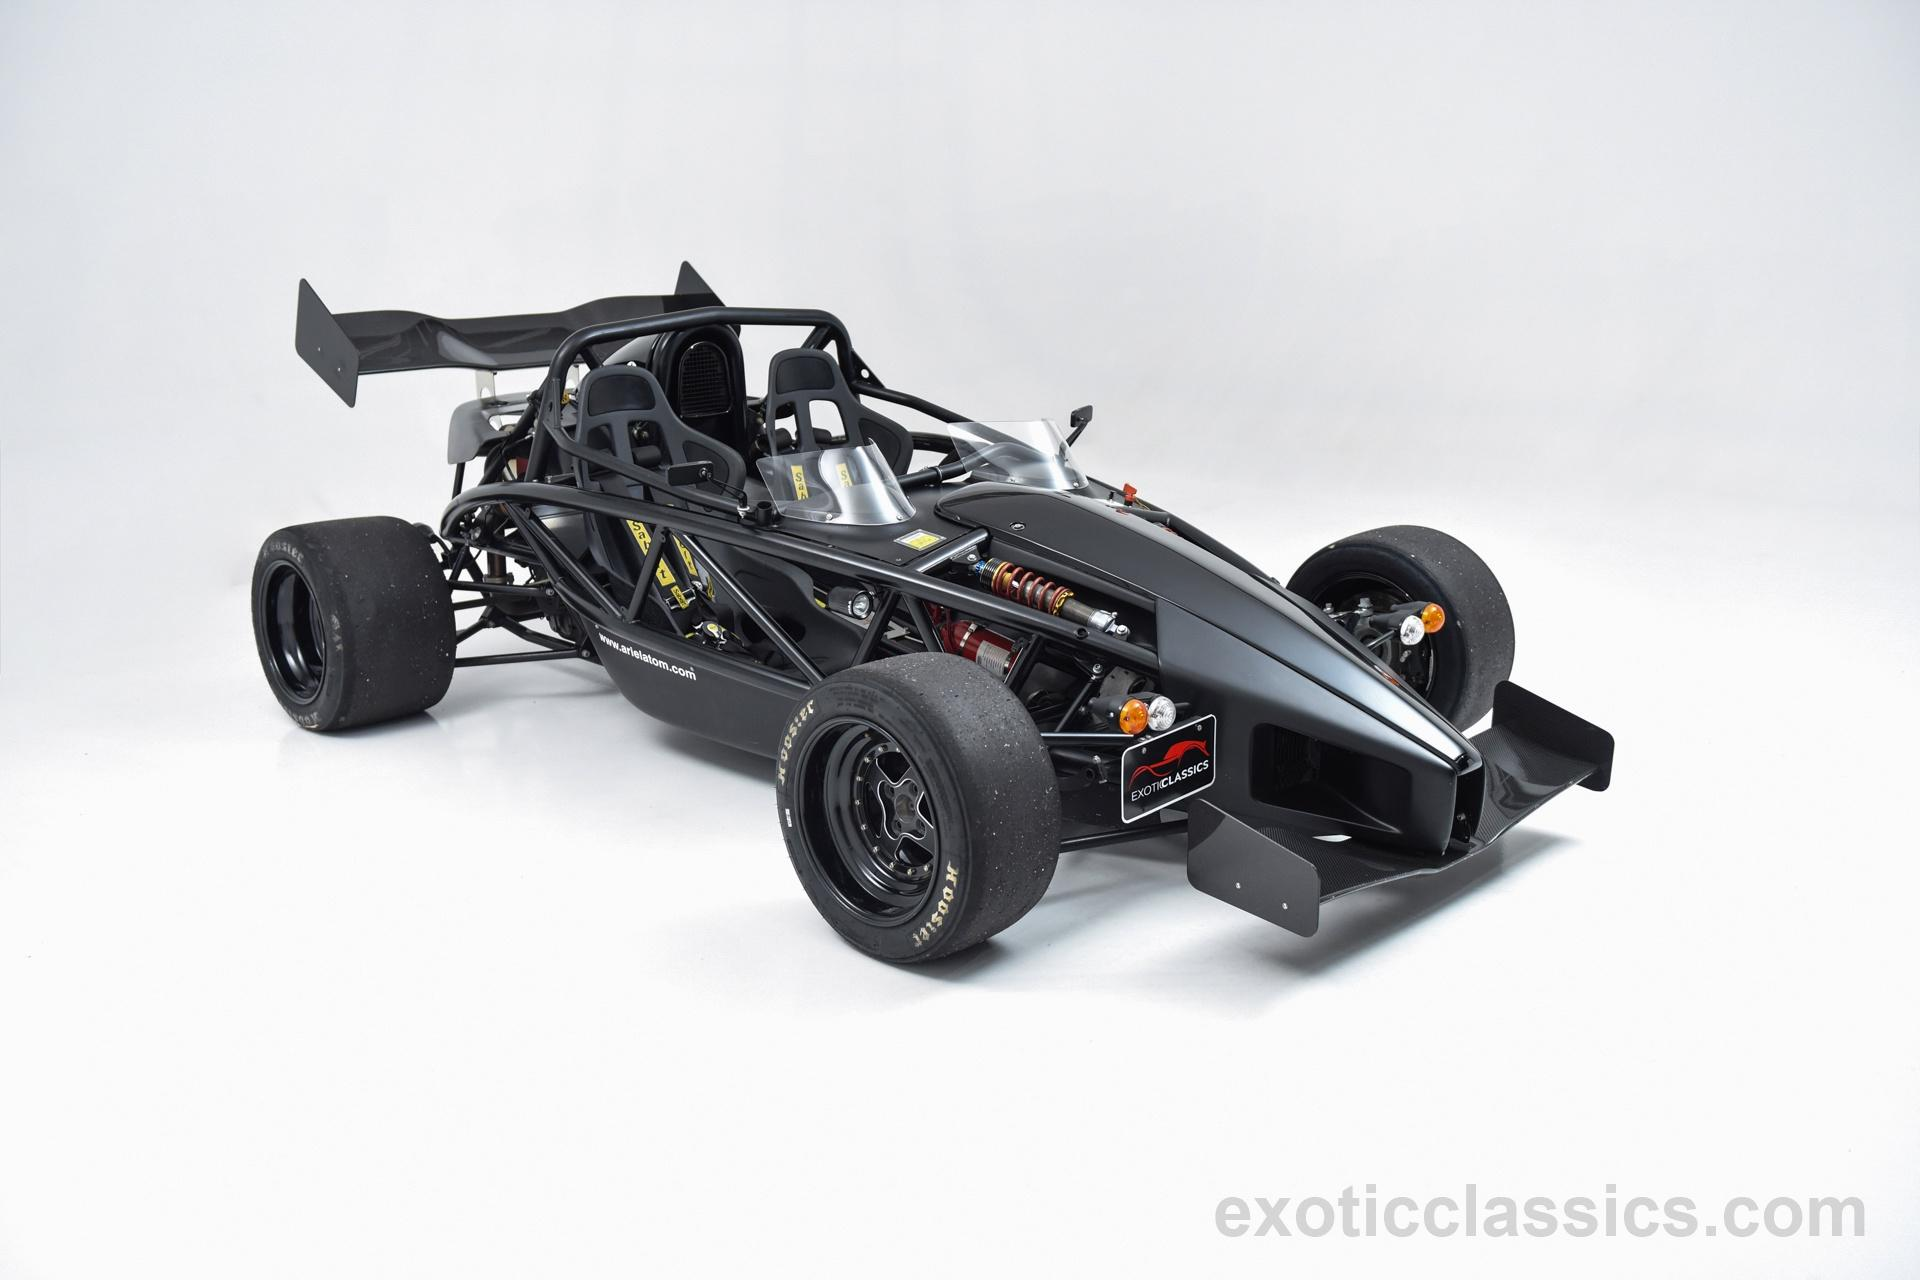 Atomic Race Cars